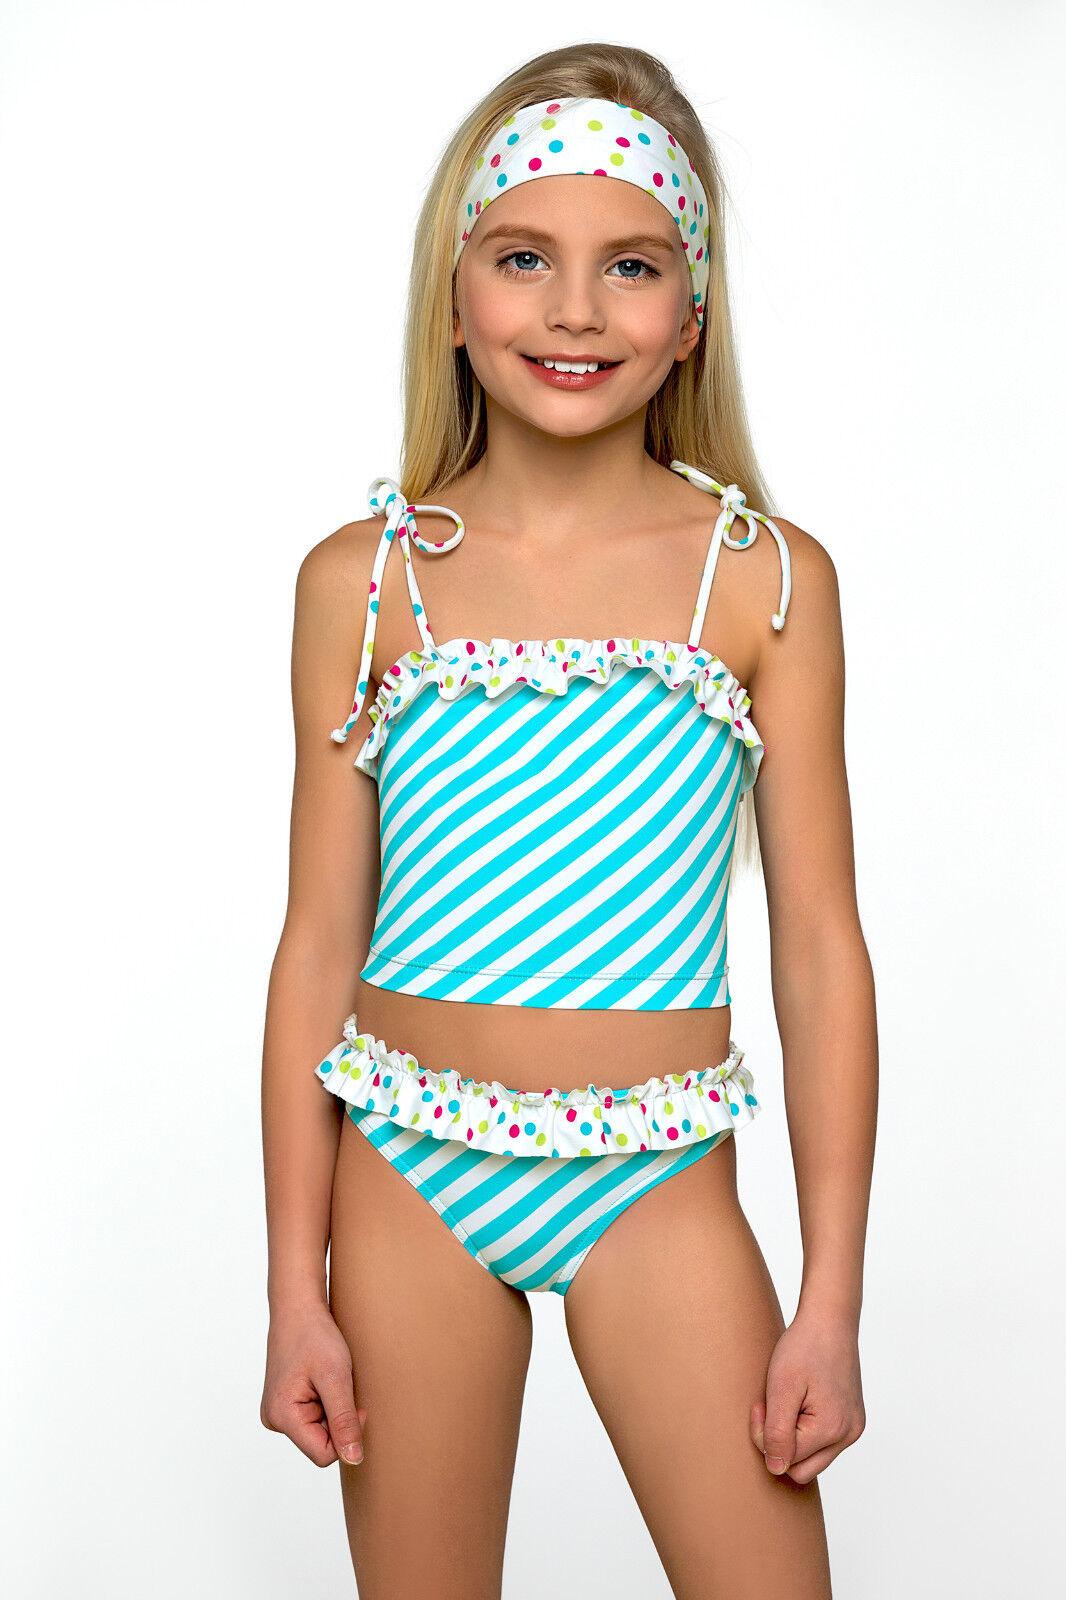 New Little Girls Sport Swimming Costume Swimwear Swimsuit Kids Age 3